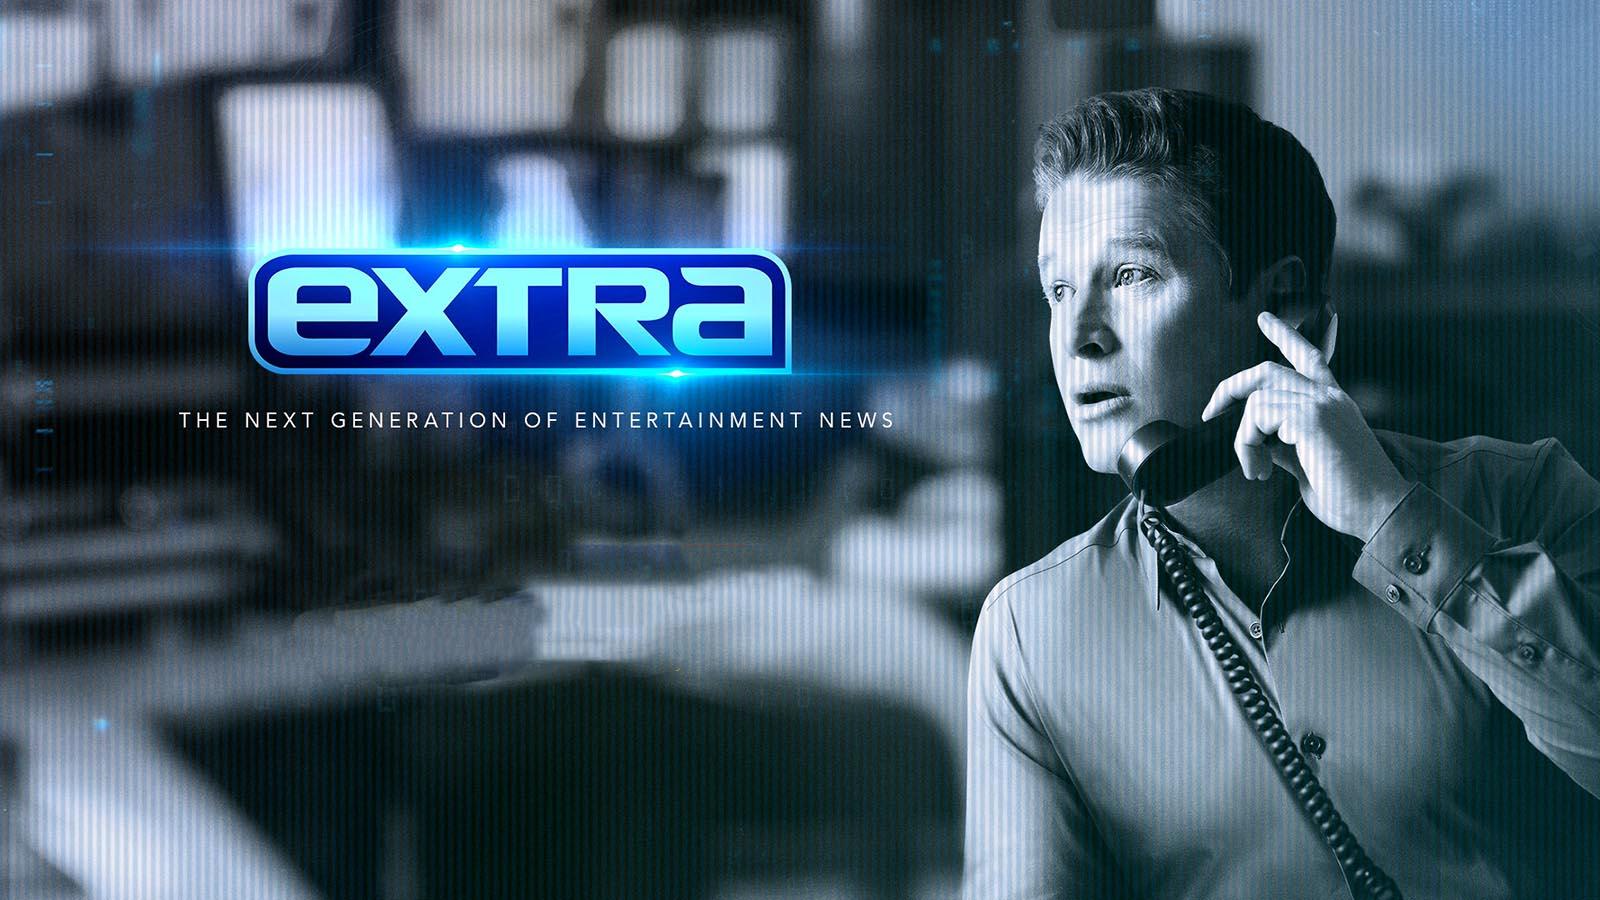 Extra, The Entertainment Magazine Show